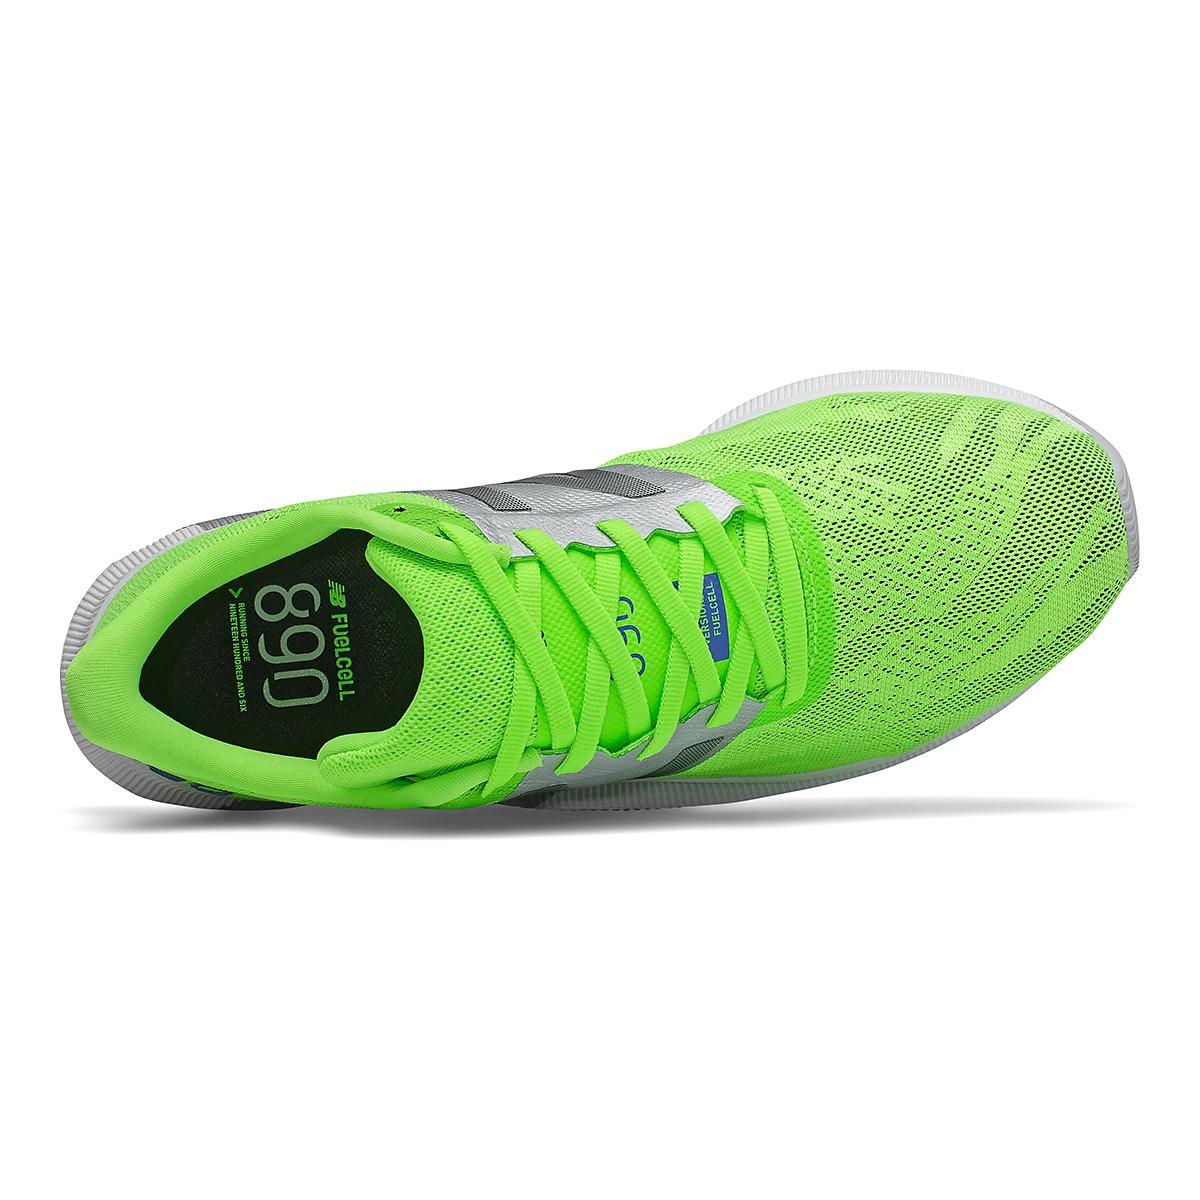 Men's New Balance 890V8 Running Shoe - Color: Energy Lime - Size: 8.5 - Width: Wide, Energy Lime, large, image 3